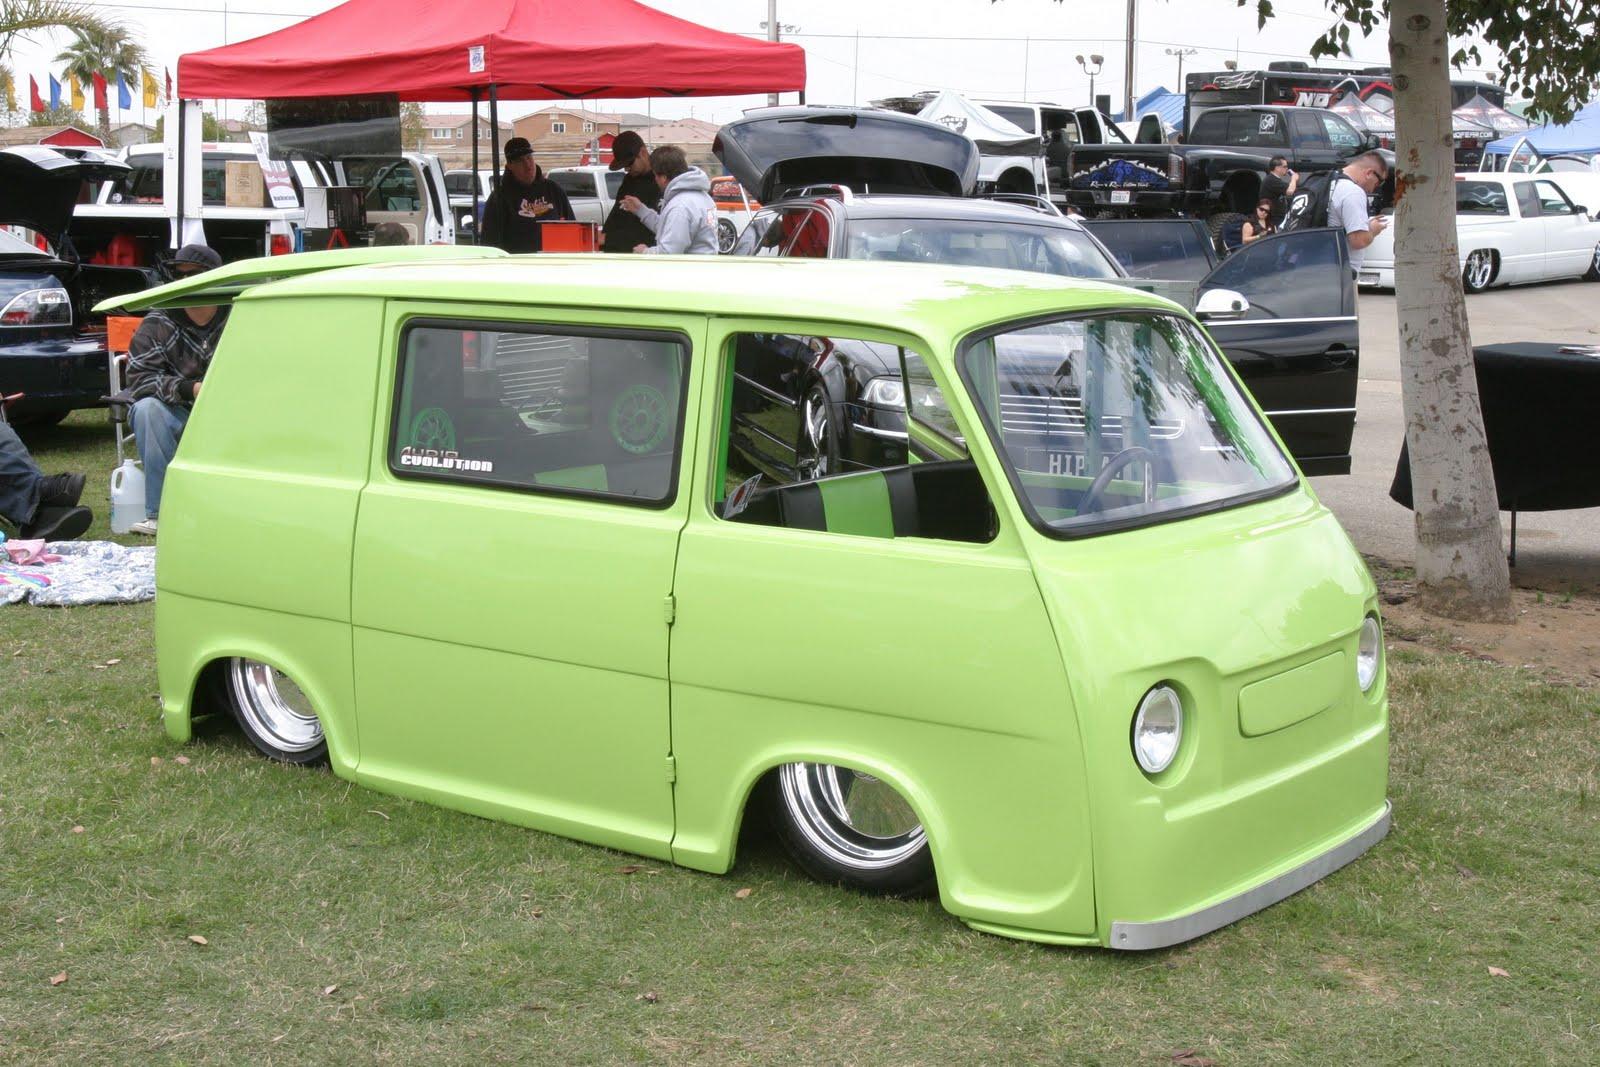 Its The Habit - its our habit: 5 Old School Vans